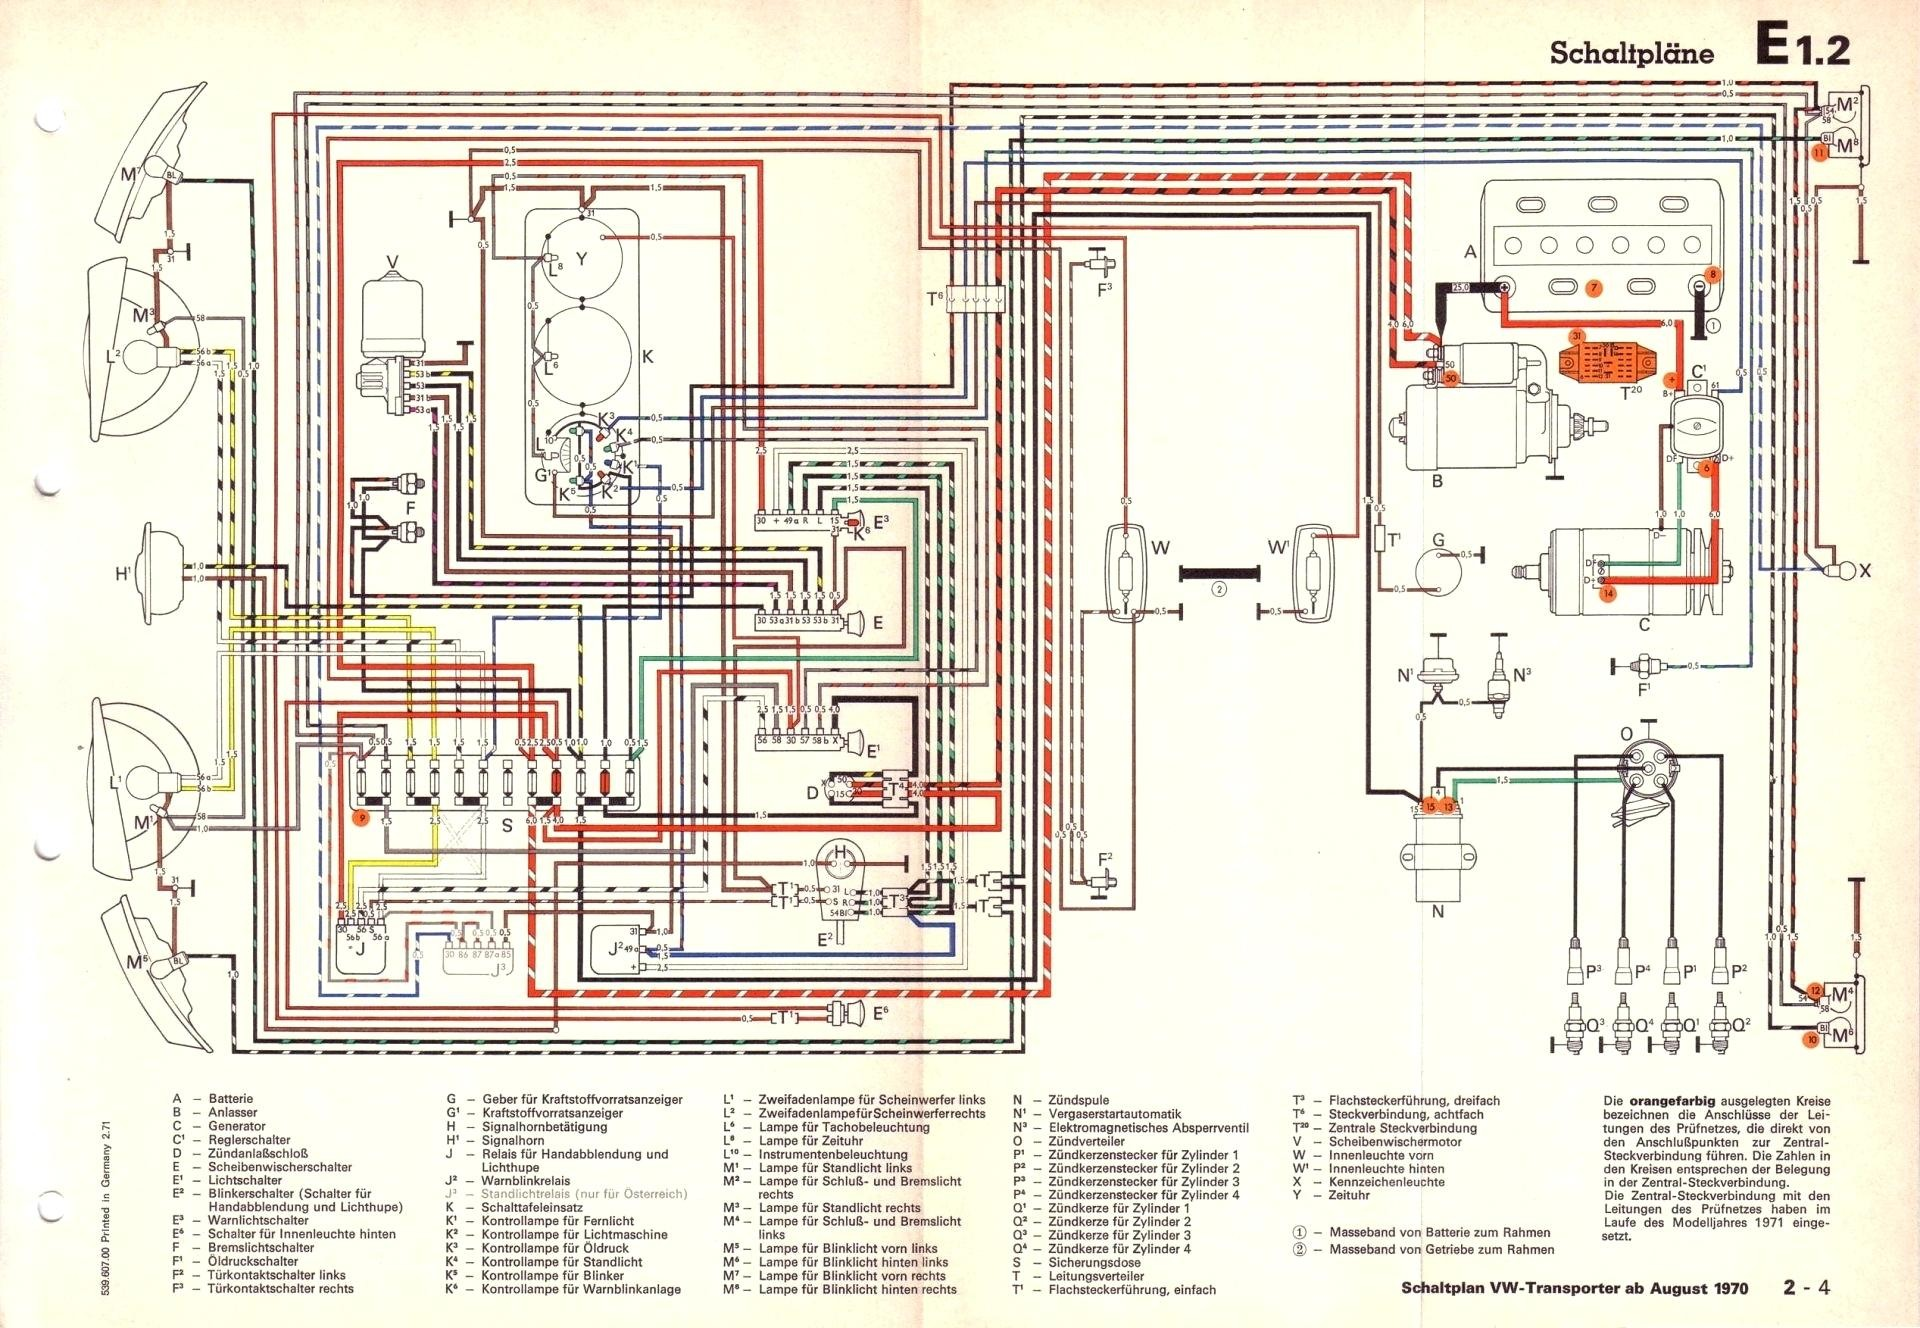 2001 Vw Beetle 2 0 Engine Diagram Wiring Diagram In Addition Vw ...